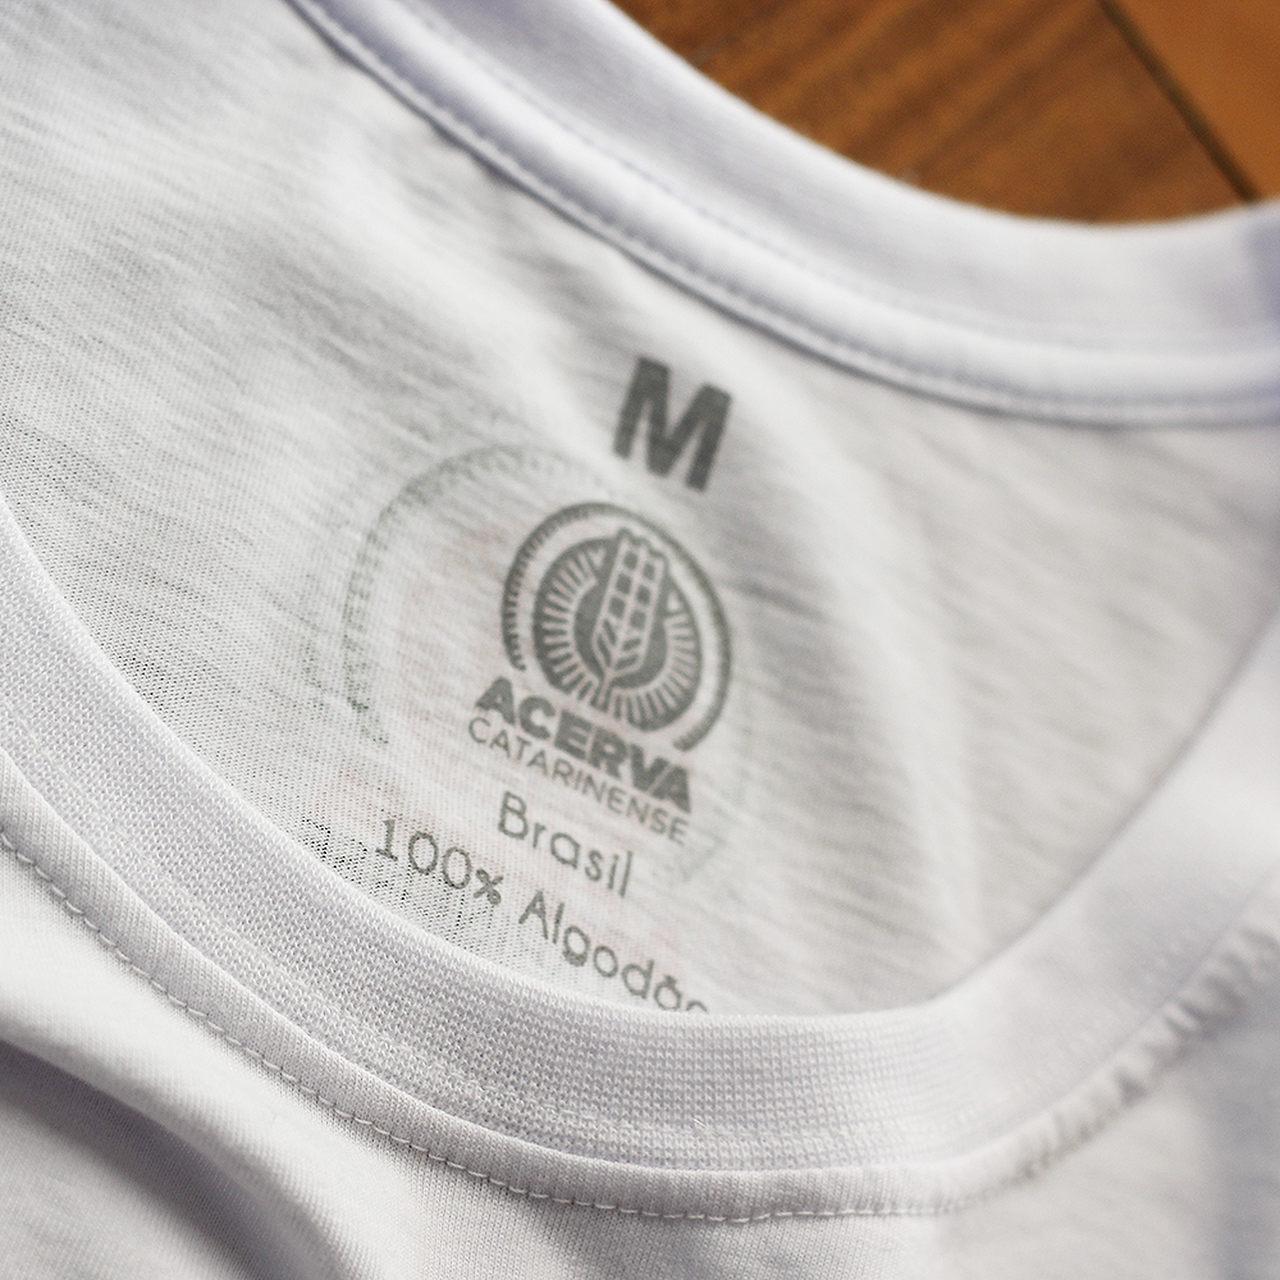 Camiseta Masculina Acerva Catarinense Branco  - Maria Cervejeira